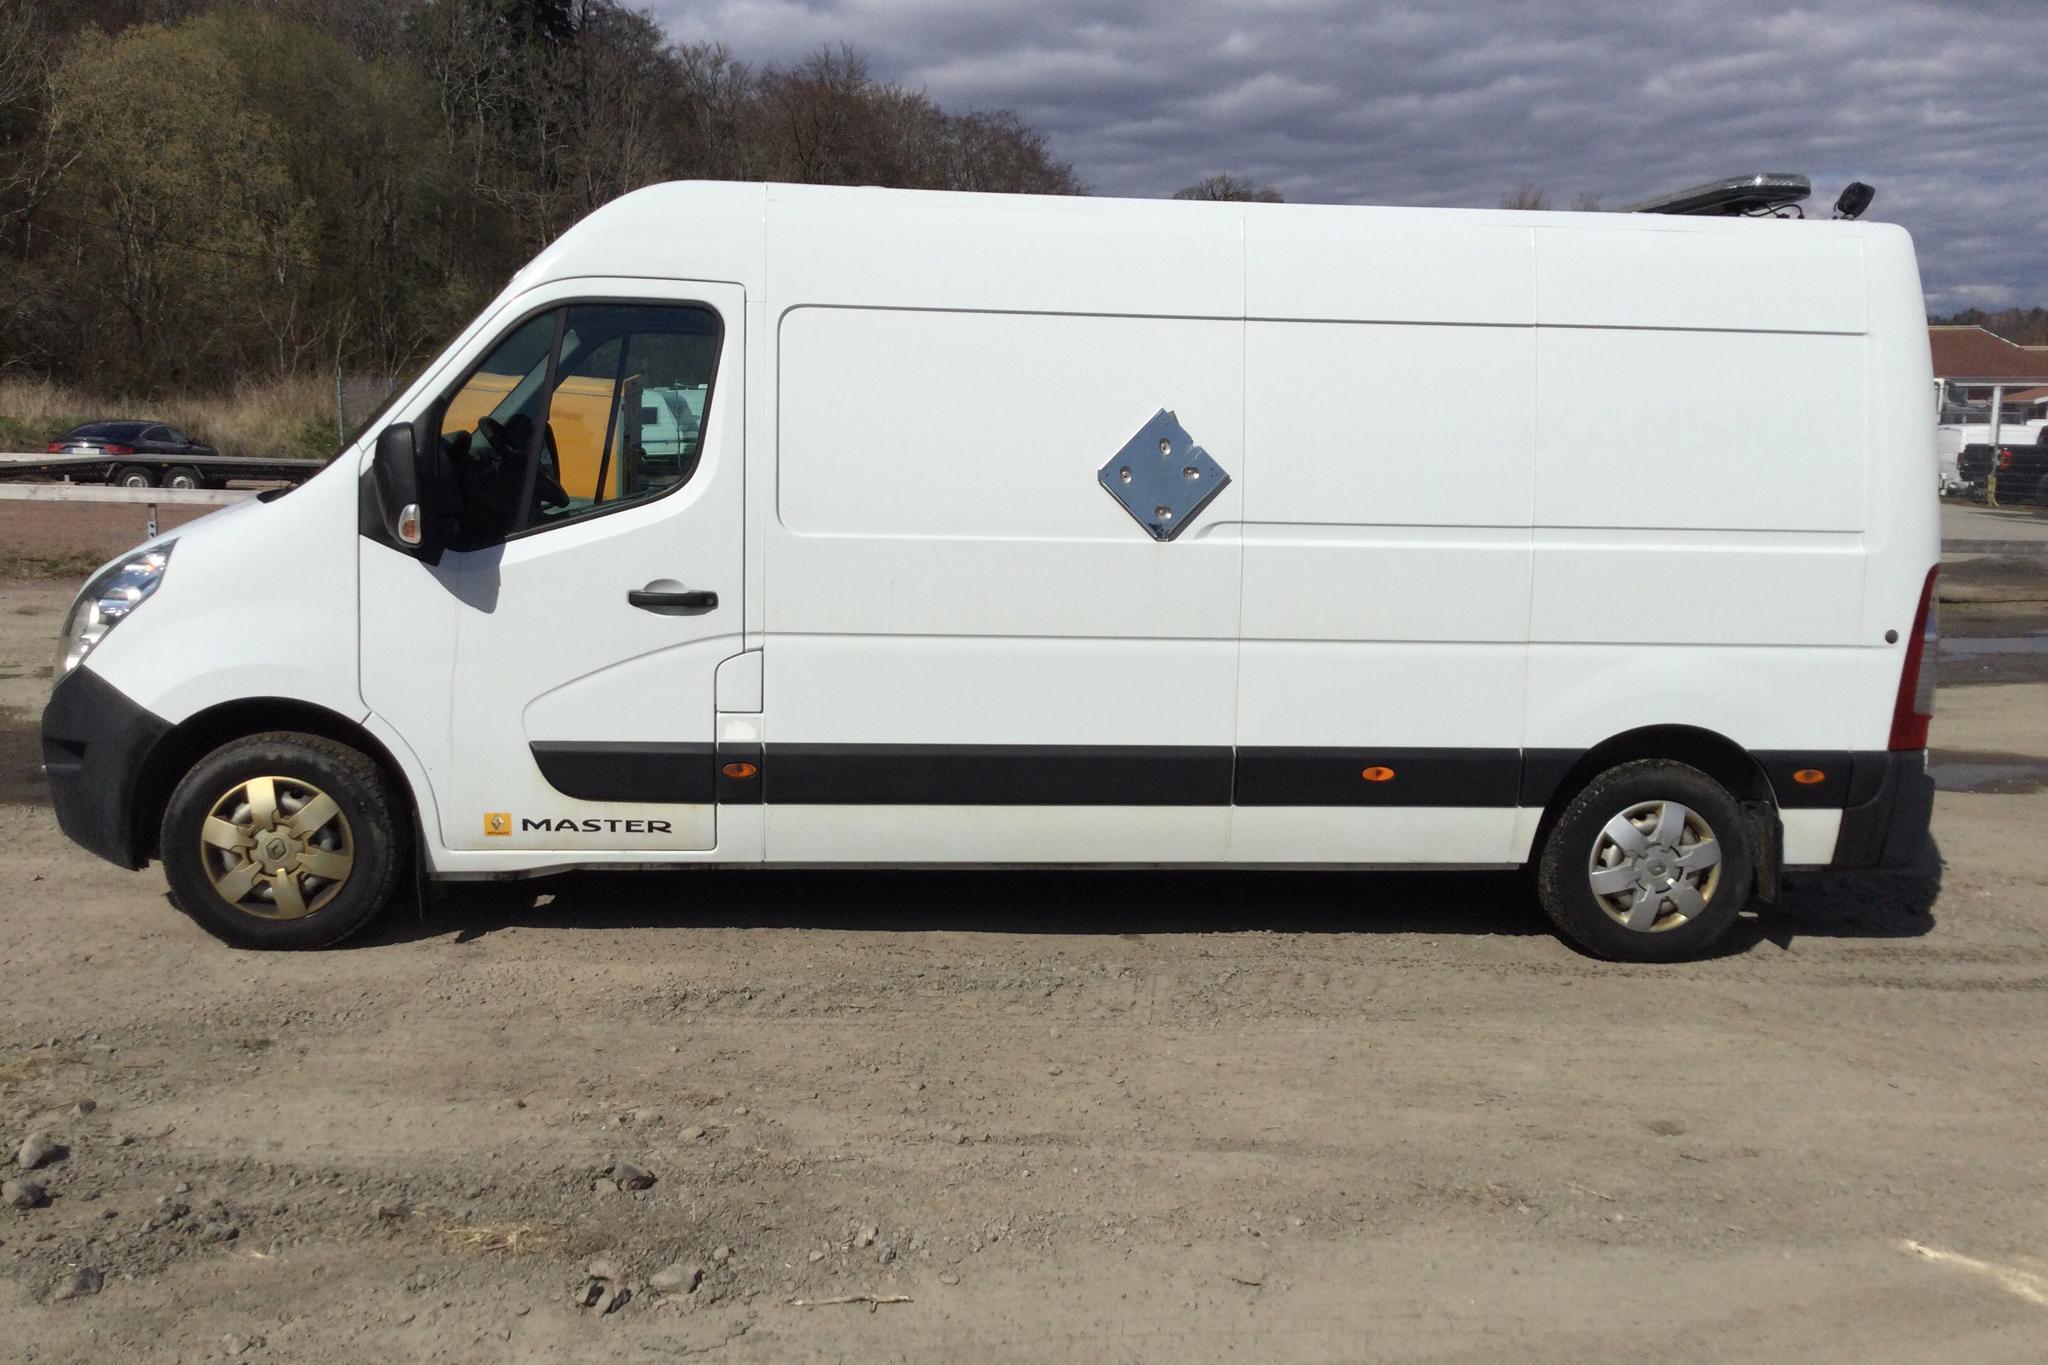 Renault Master 2.3 dCi FAP 2WD (165hk) - 14 668 mil - Manuell - vit - 2015